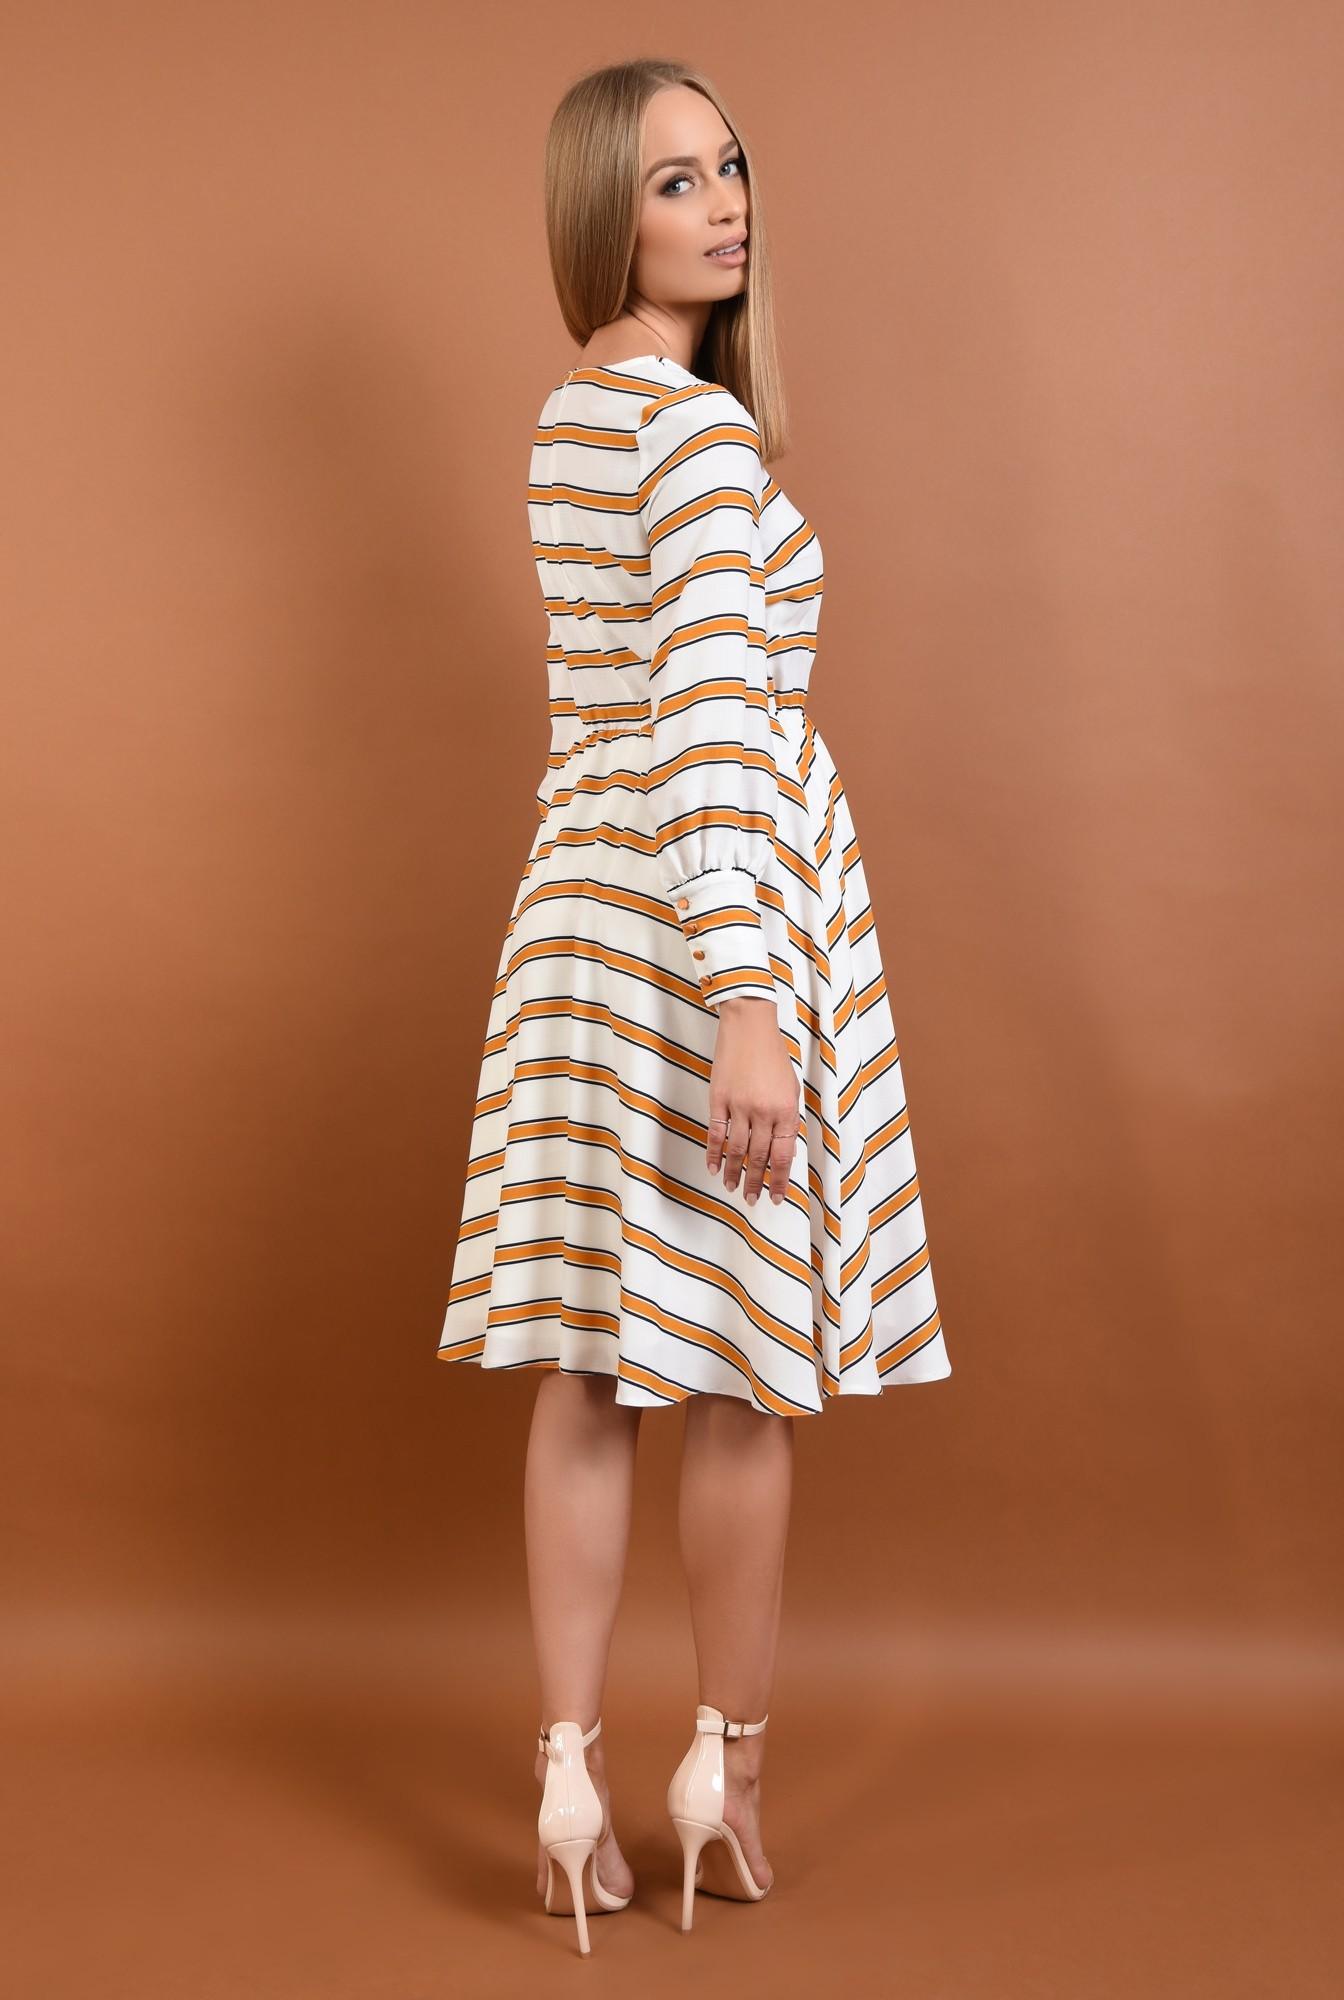 1 - 360 - rochie casual imprimata, alb, mustar, bie, cusatura in talie